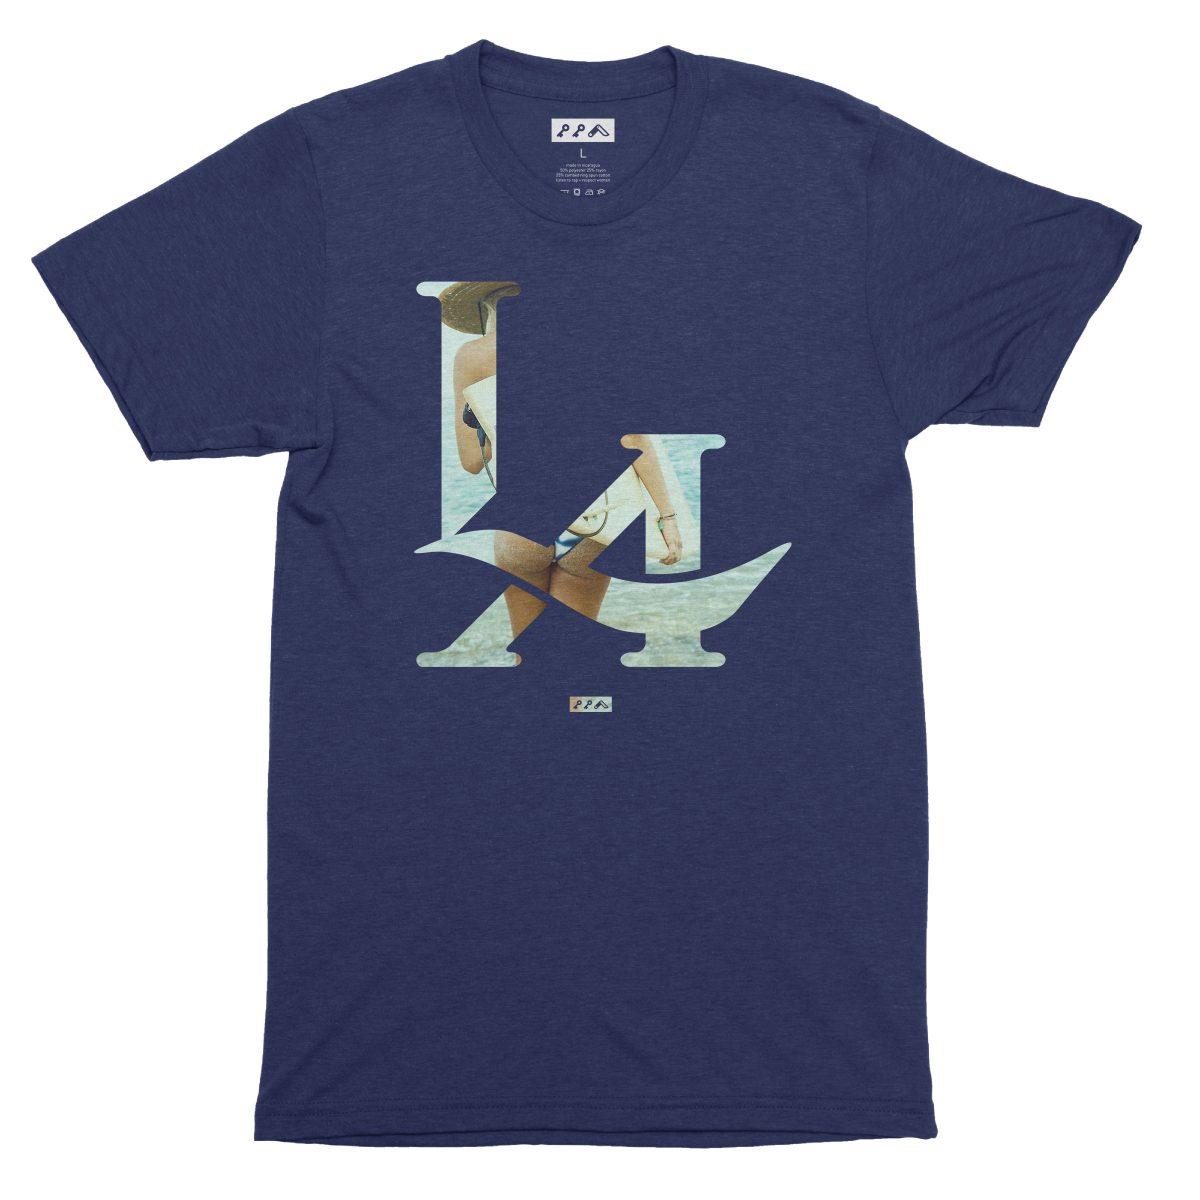 LA logo los angeles surfs up bikini beach butt t-shirt in navy by kikicutt